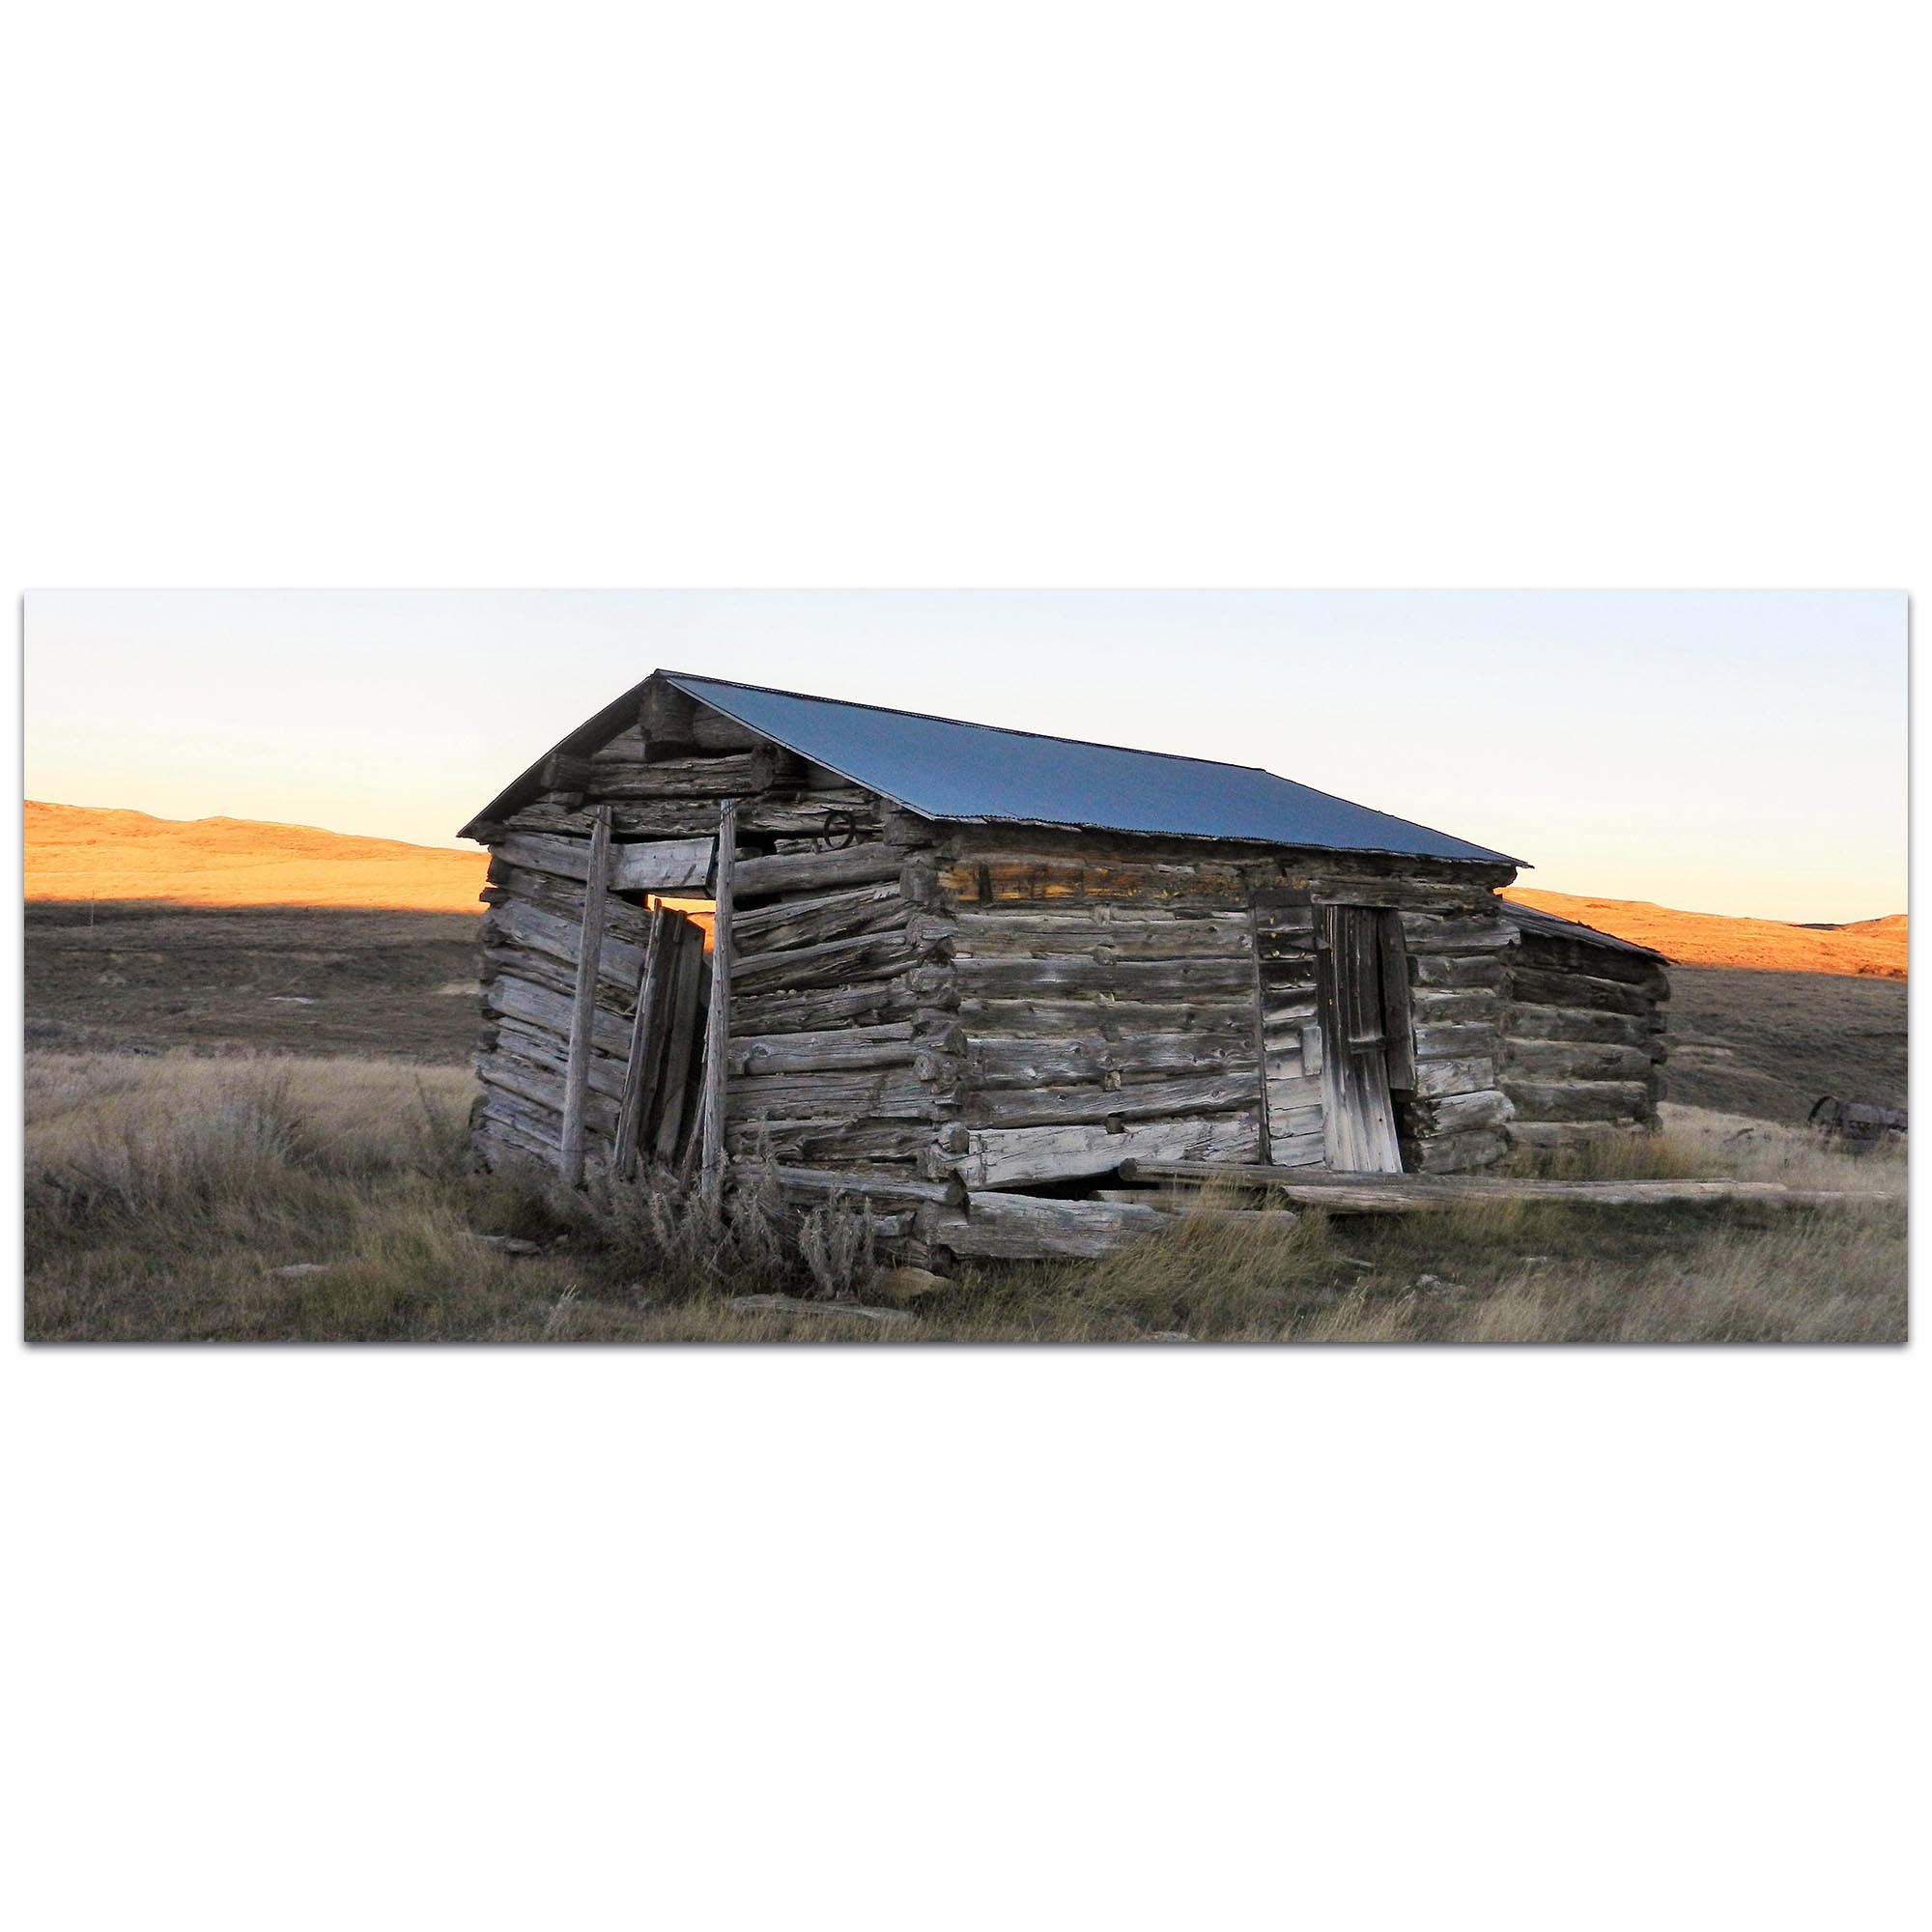 Western Wall Art 'The Log House' - American West Decor on Metal or Plexiglass